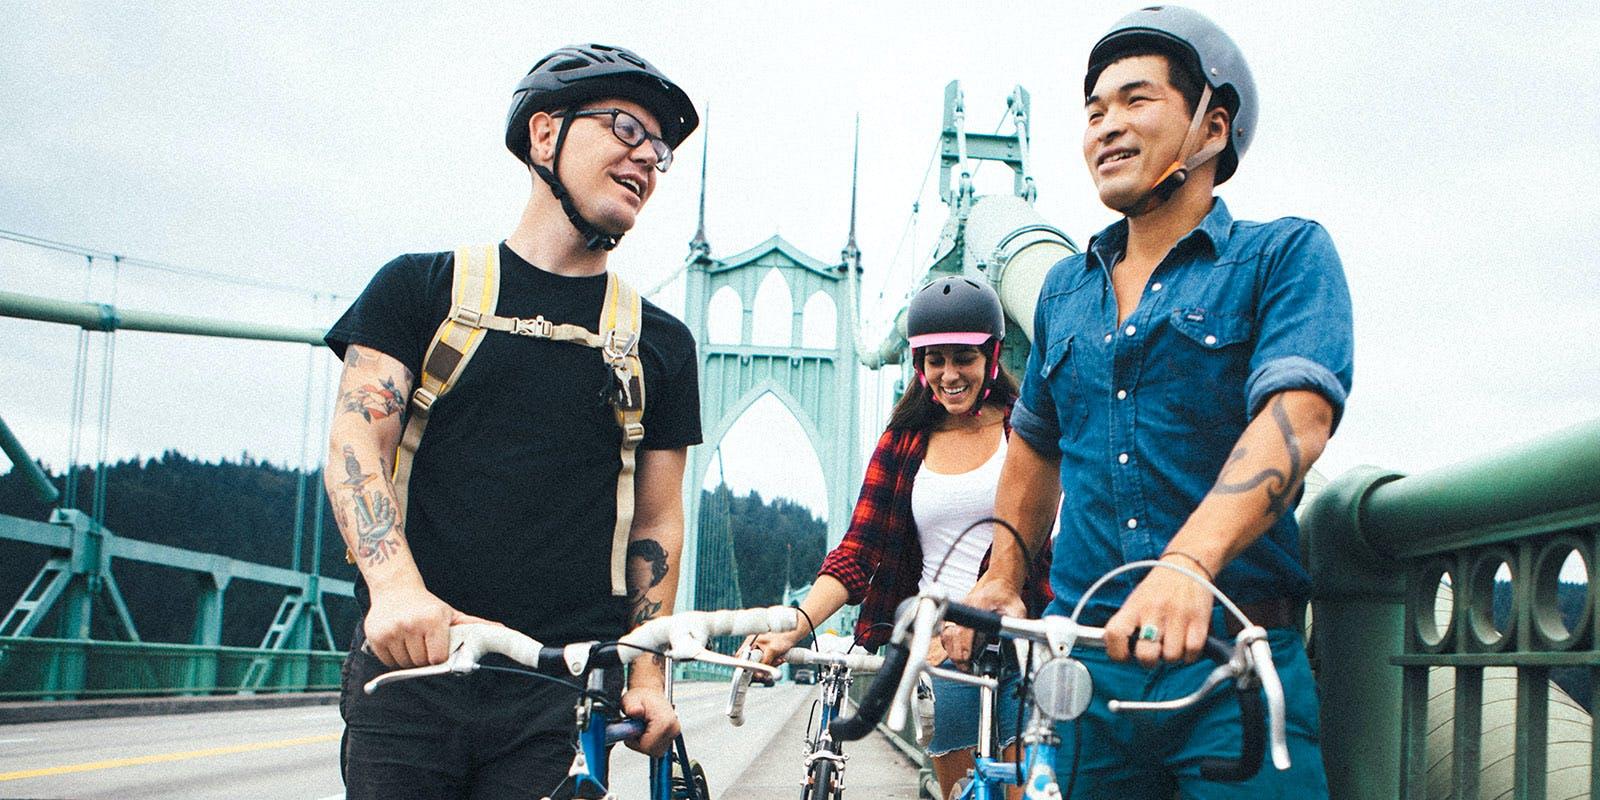 Bike-oriented image